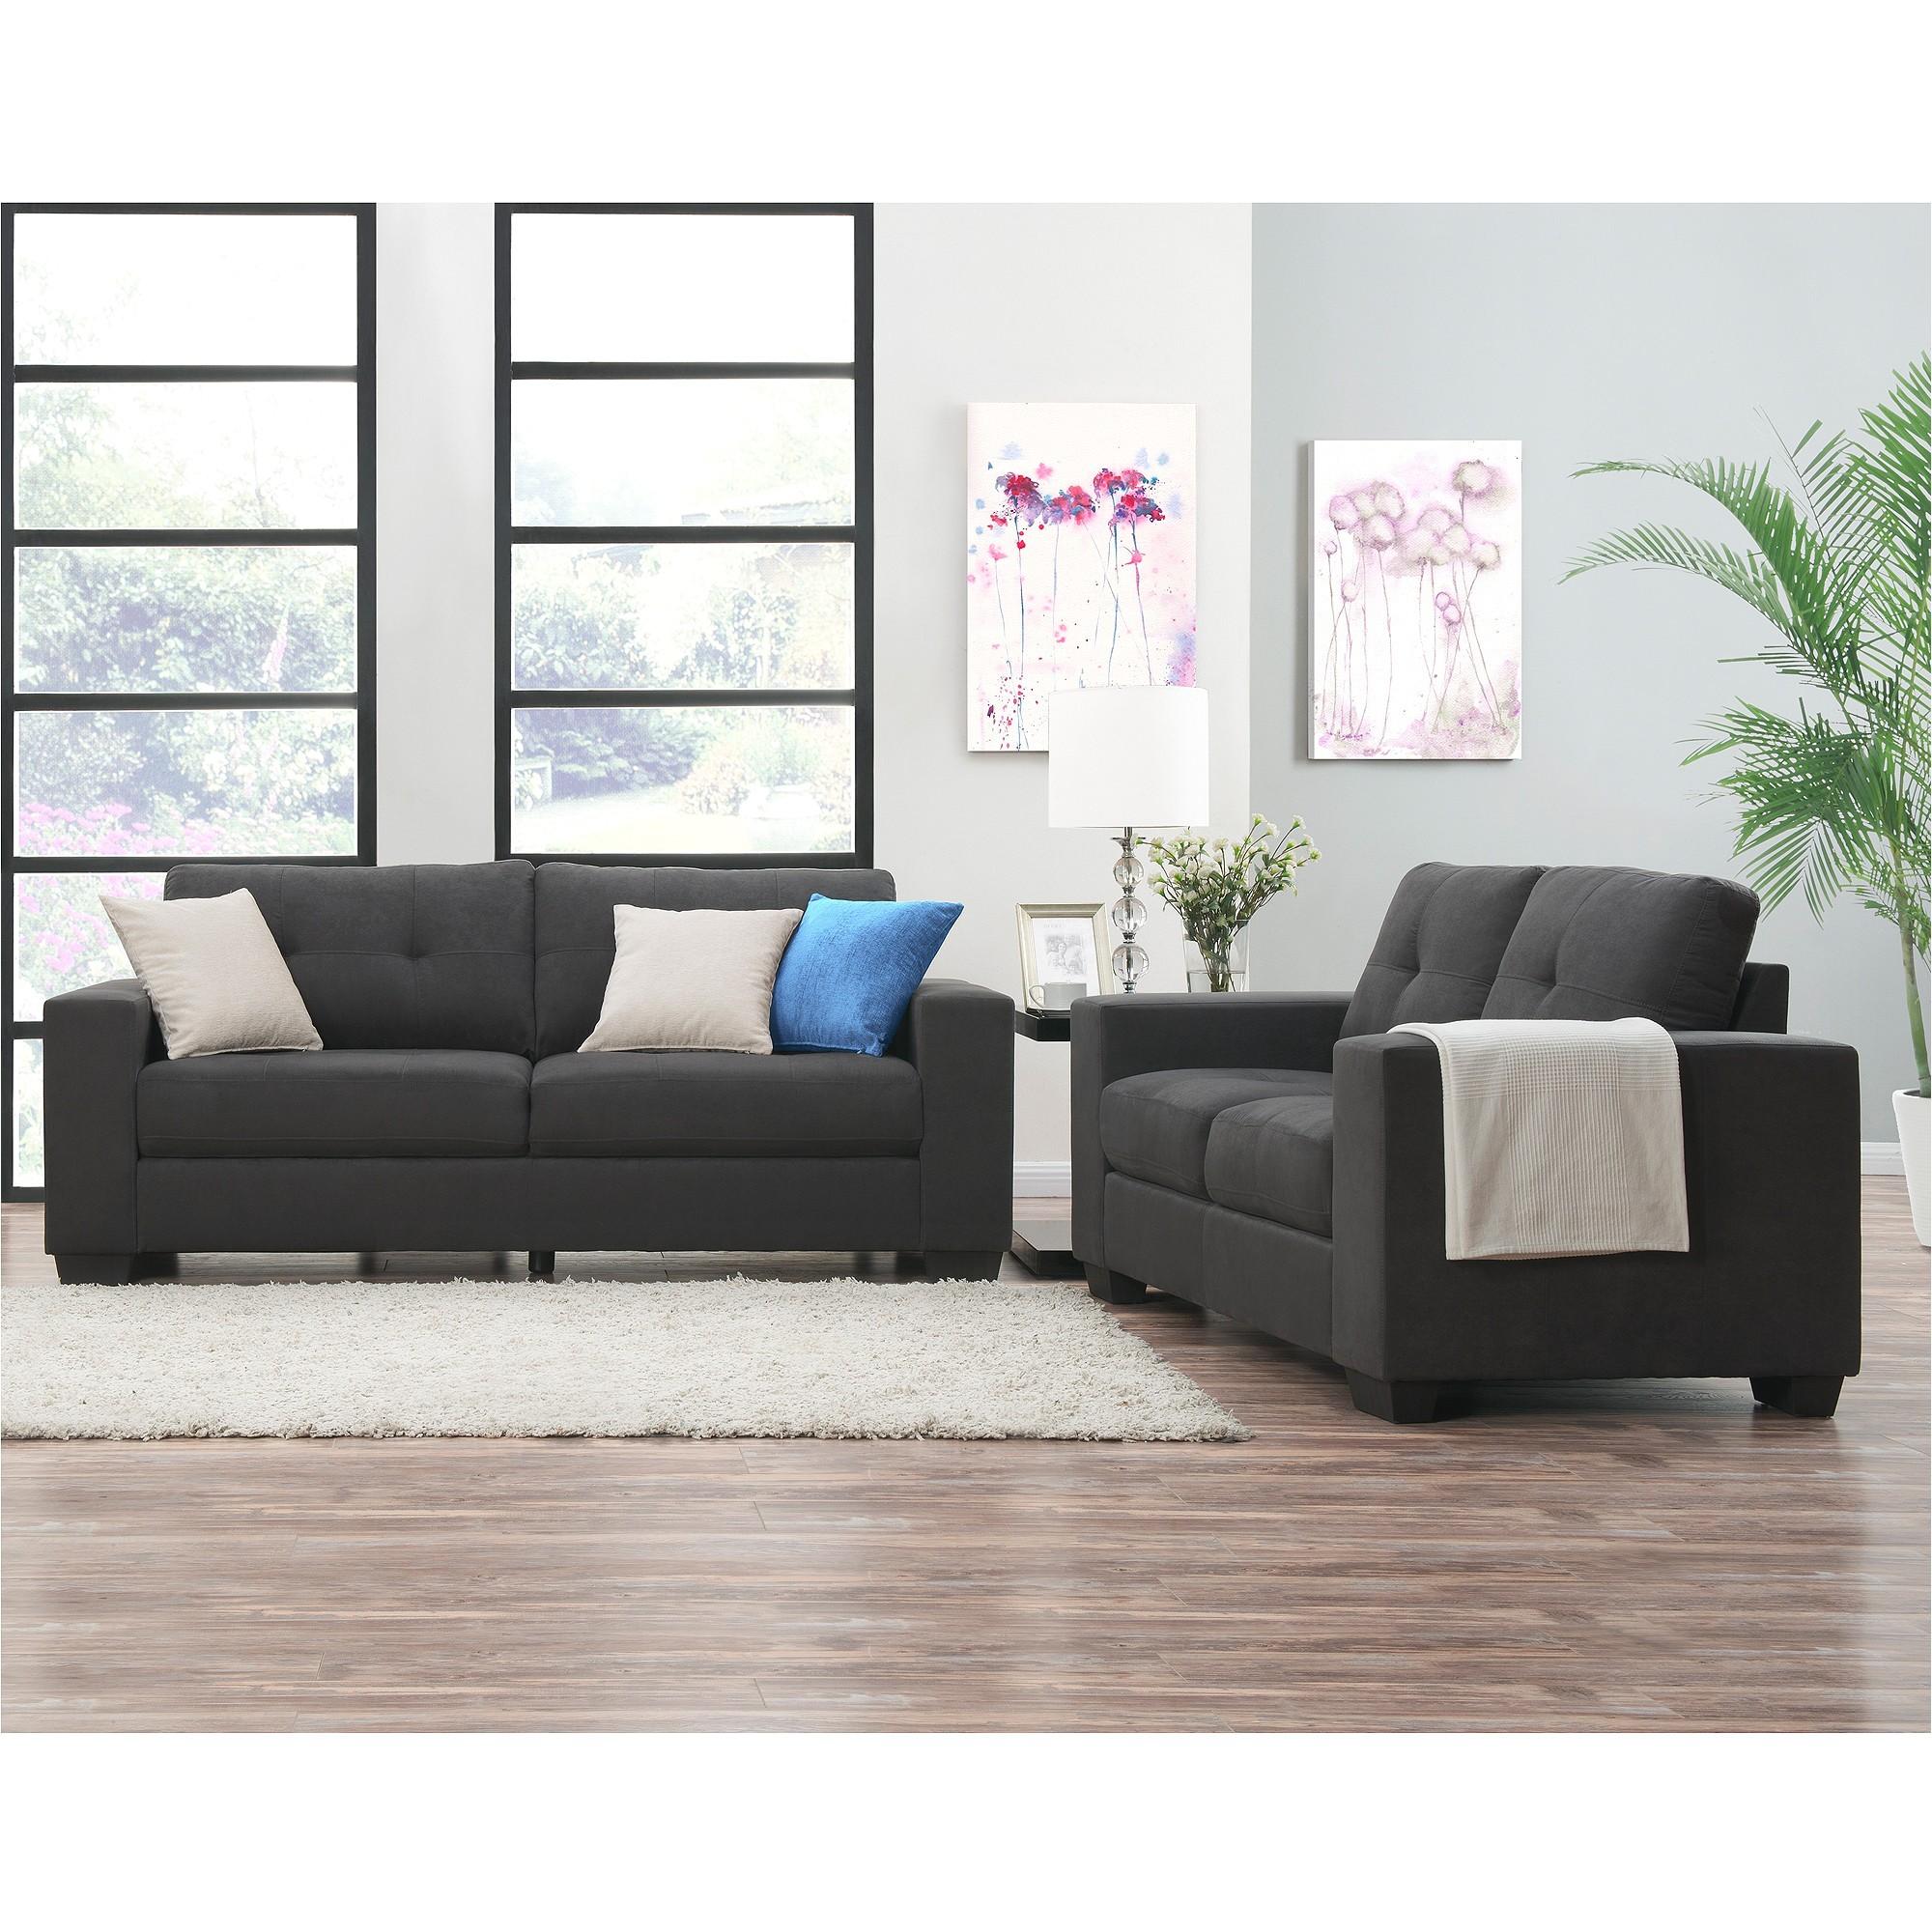 buchannan microfiber corner sectional sofa full size